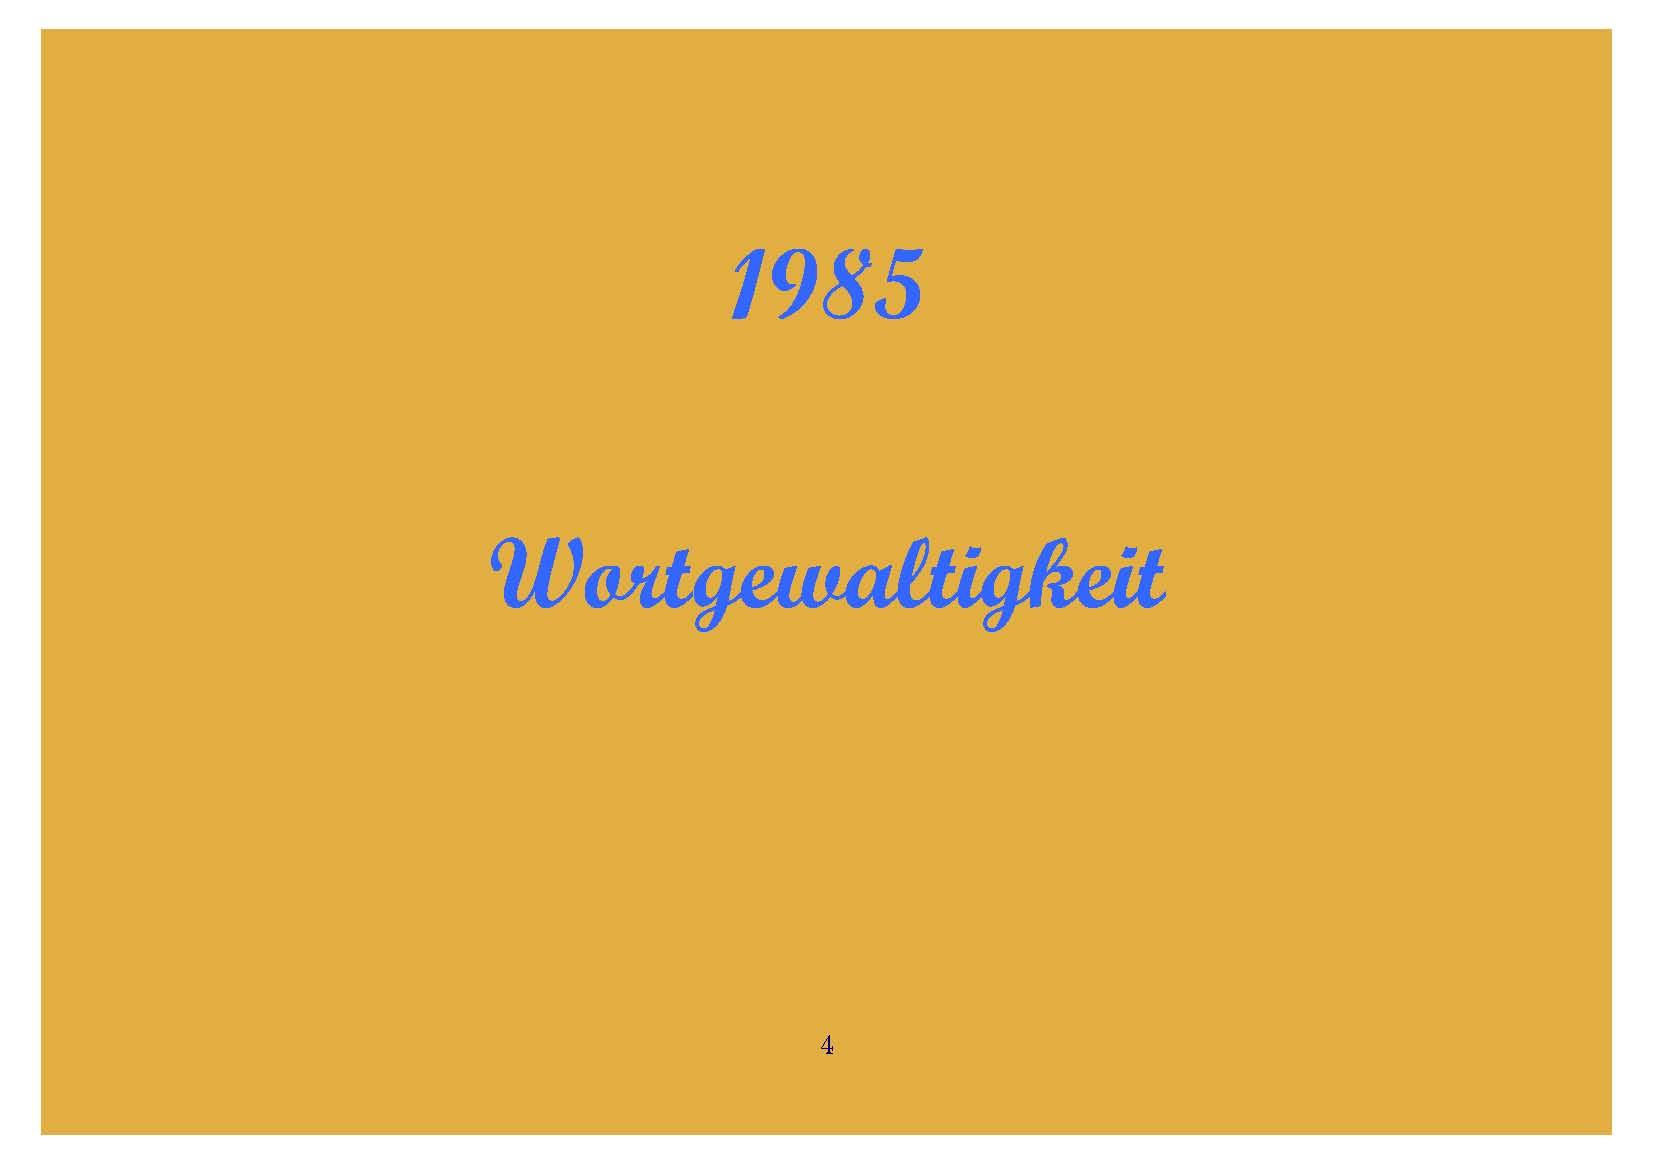 ™Gigabuch-Bibliothek/iAutobiographie Band 6/Kapitel 1